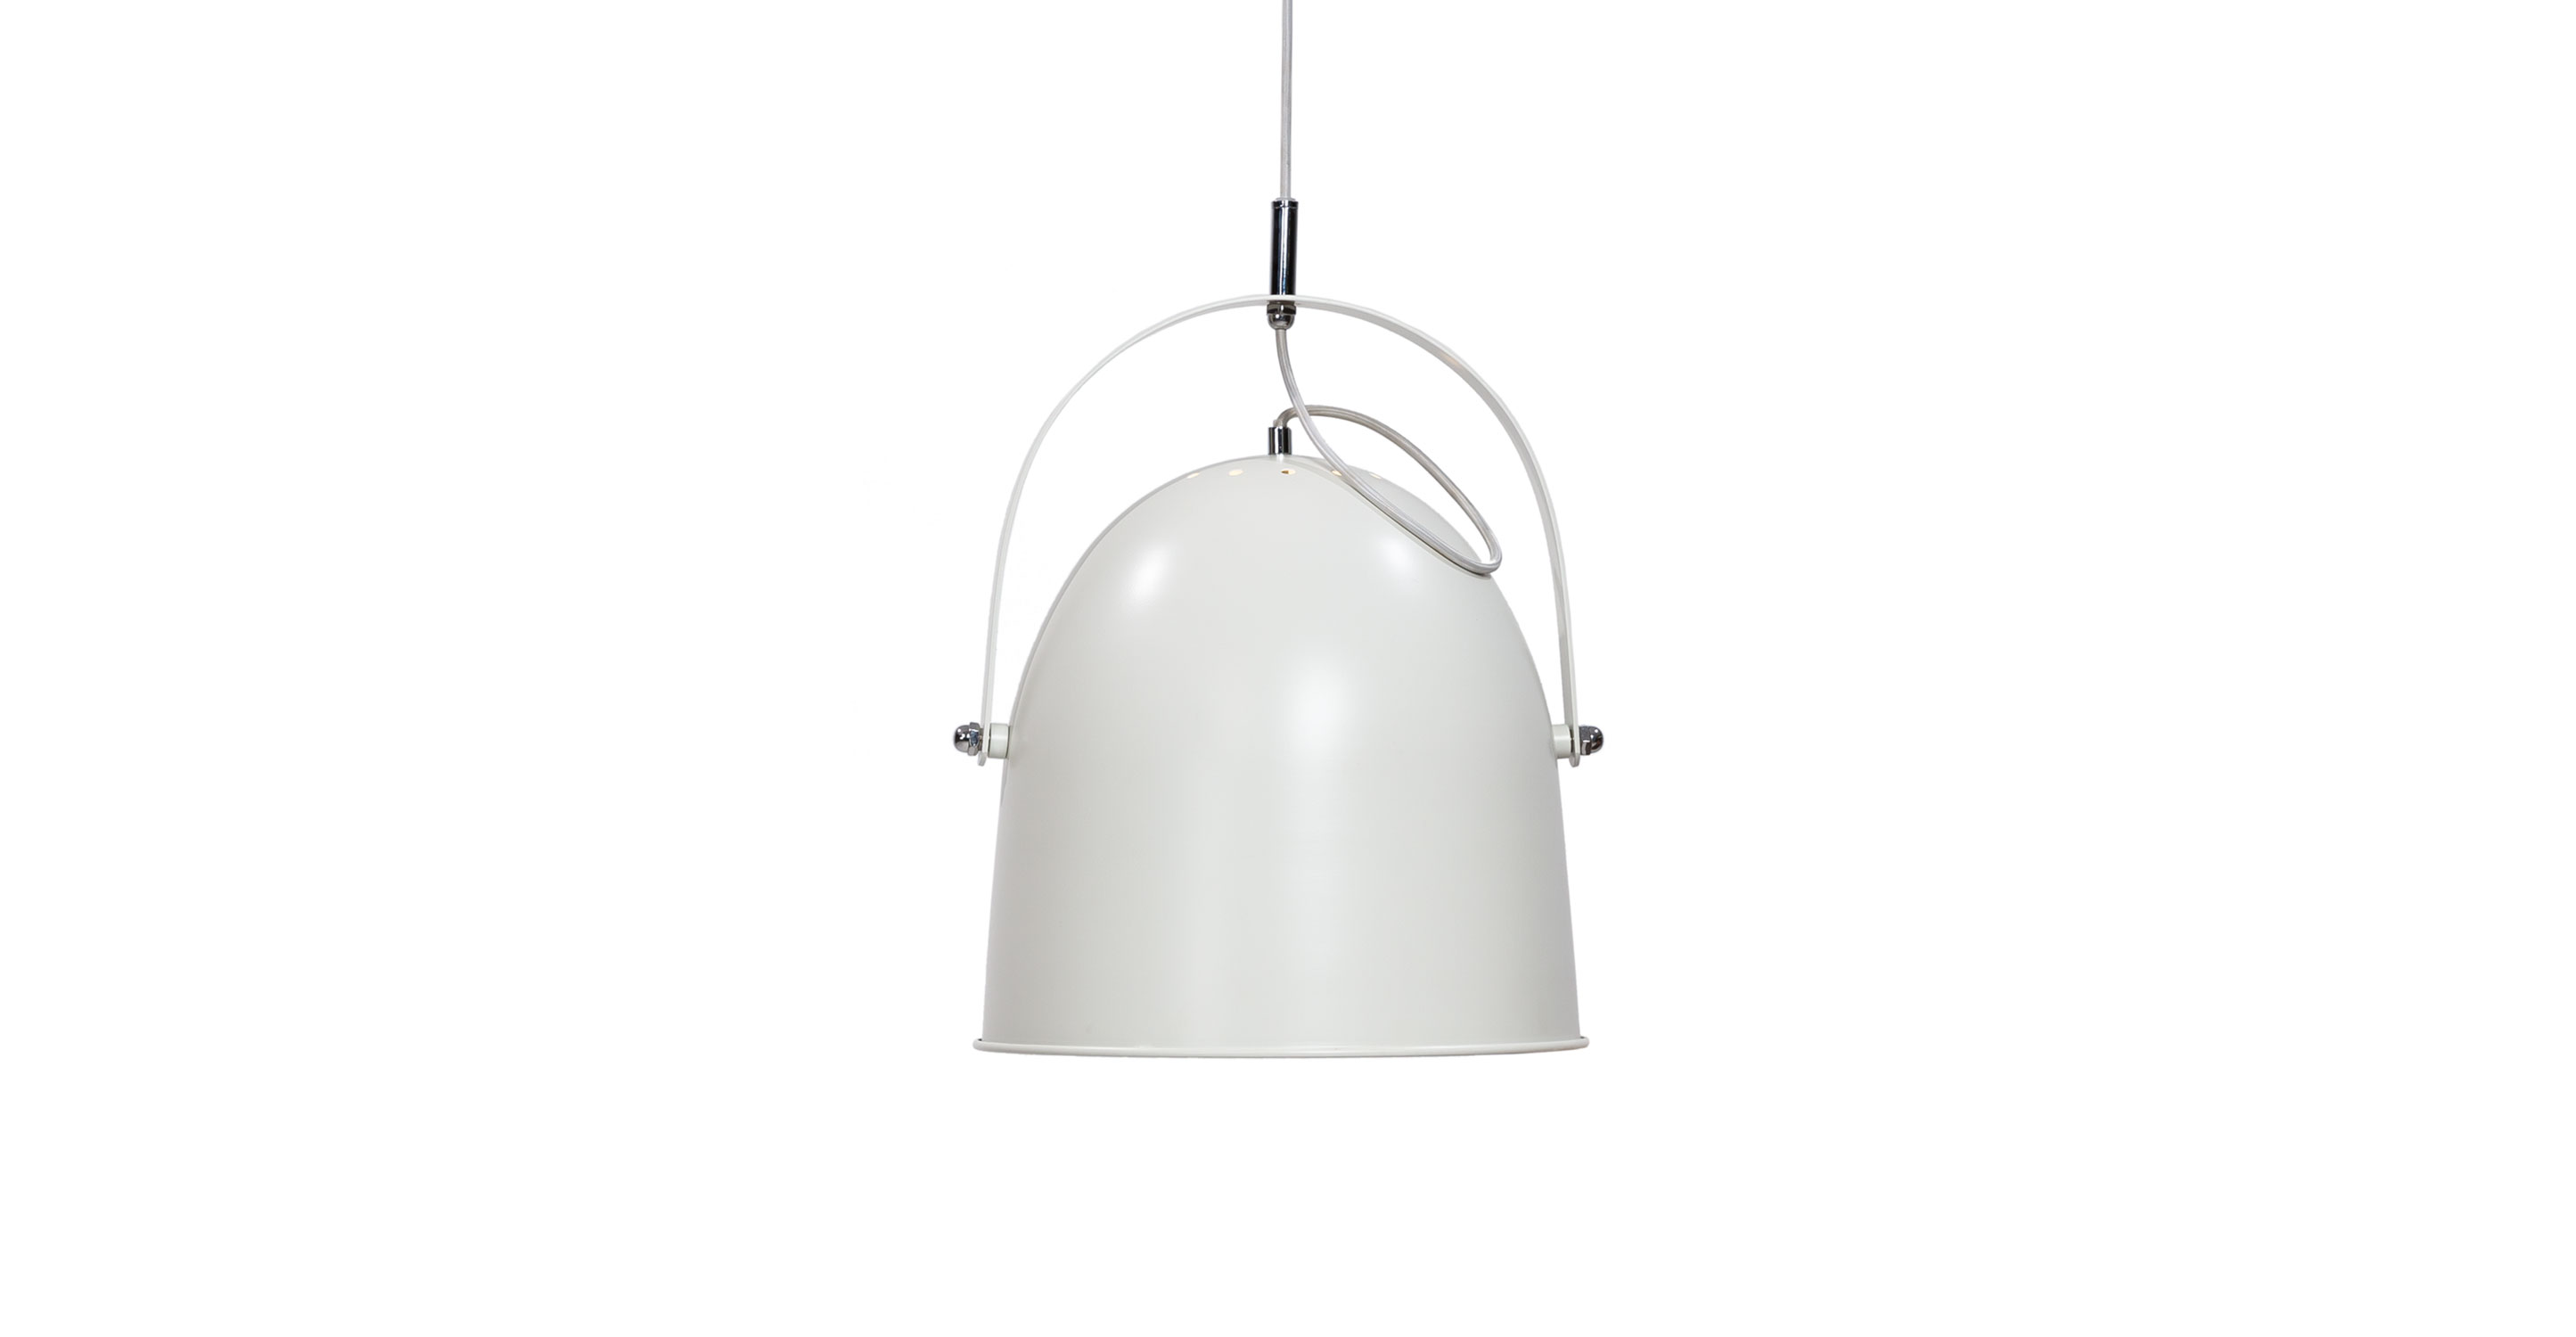 Pivot White Pendant Lamp Lighting Article Modern